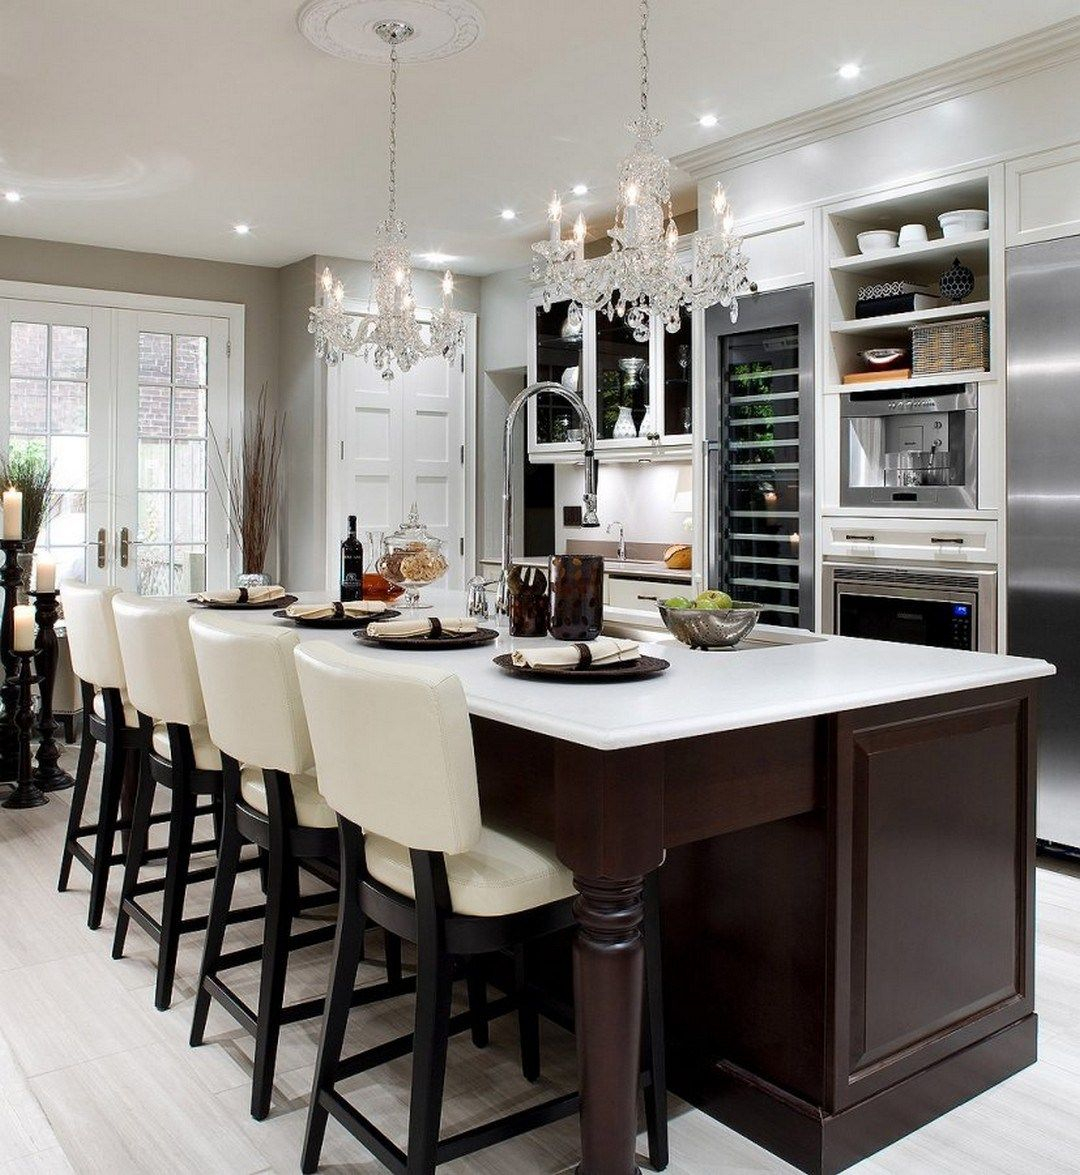 Candice Olson Interior Design Living Room, Bedroom